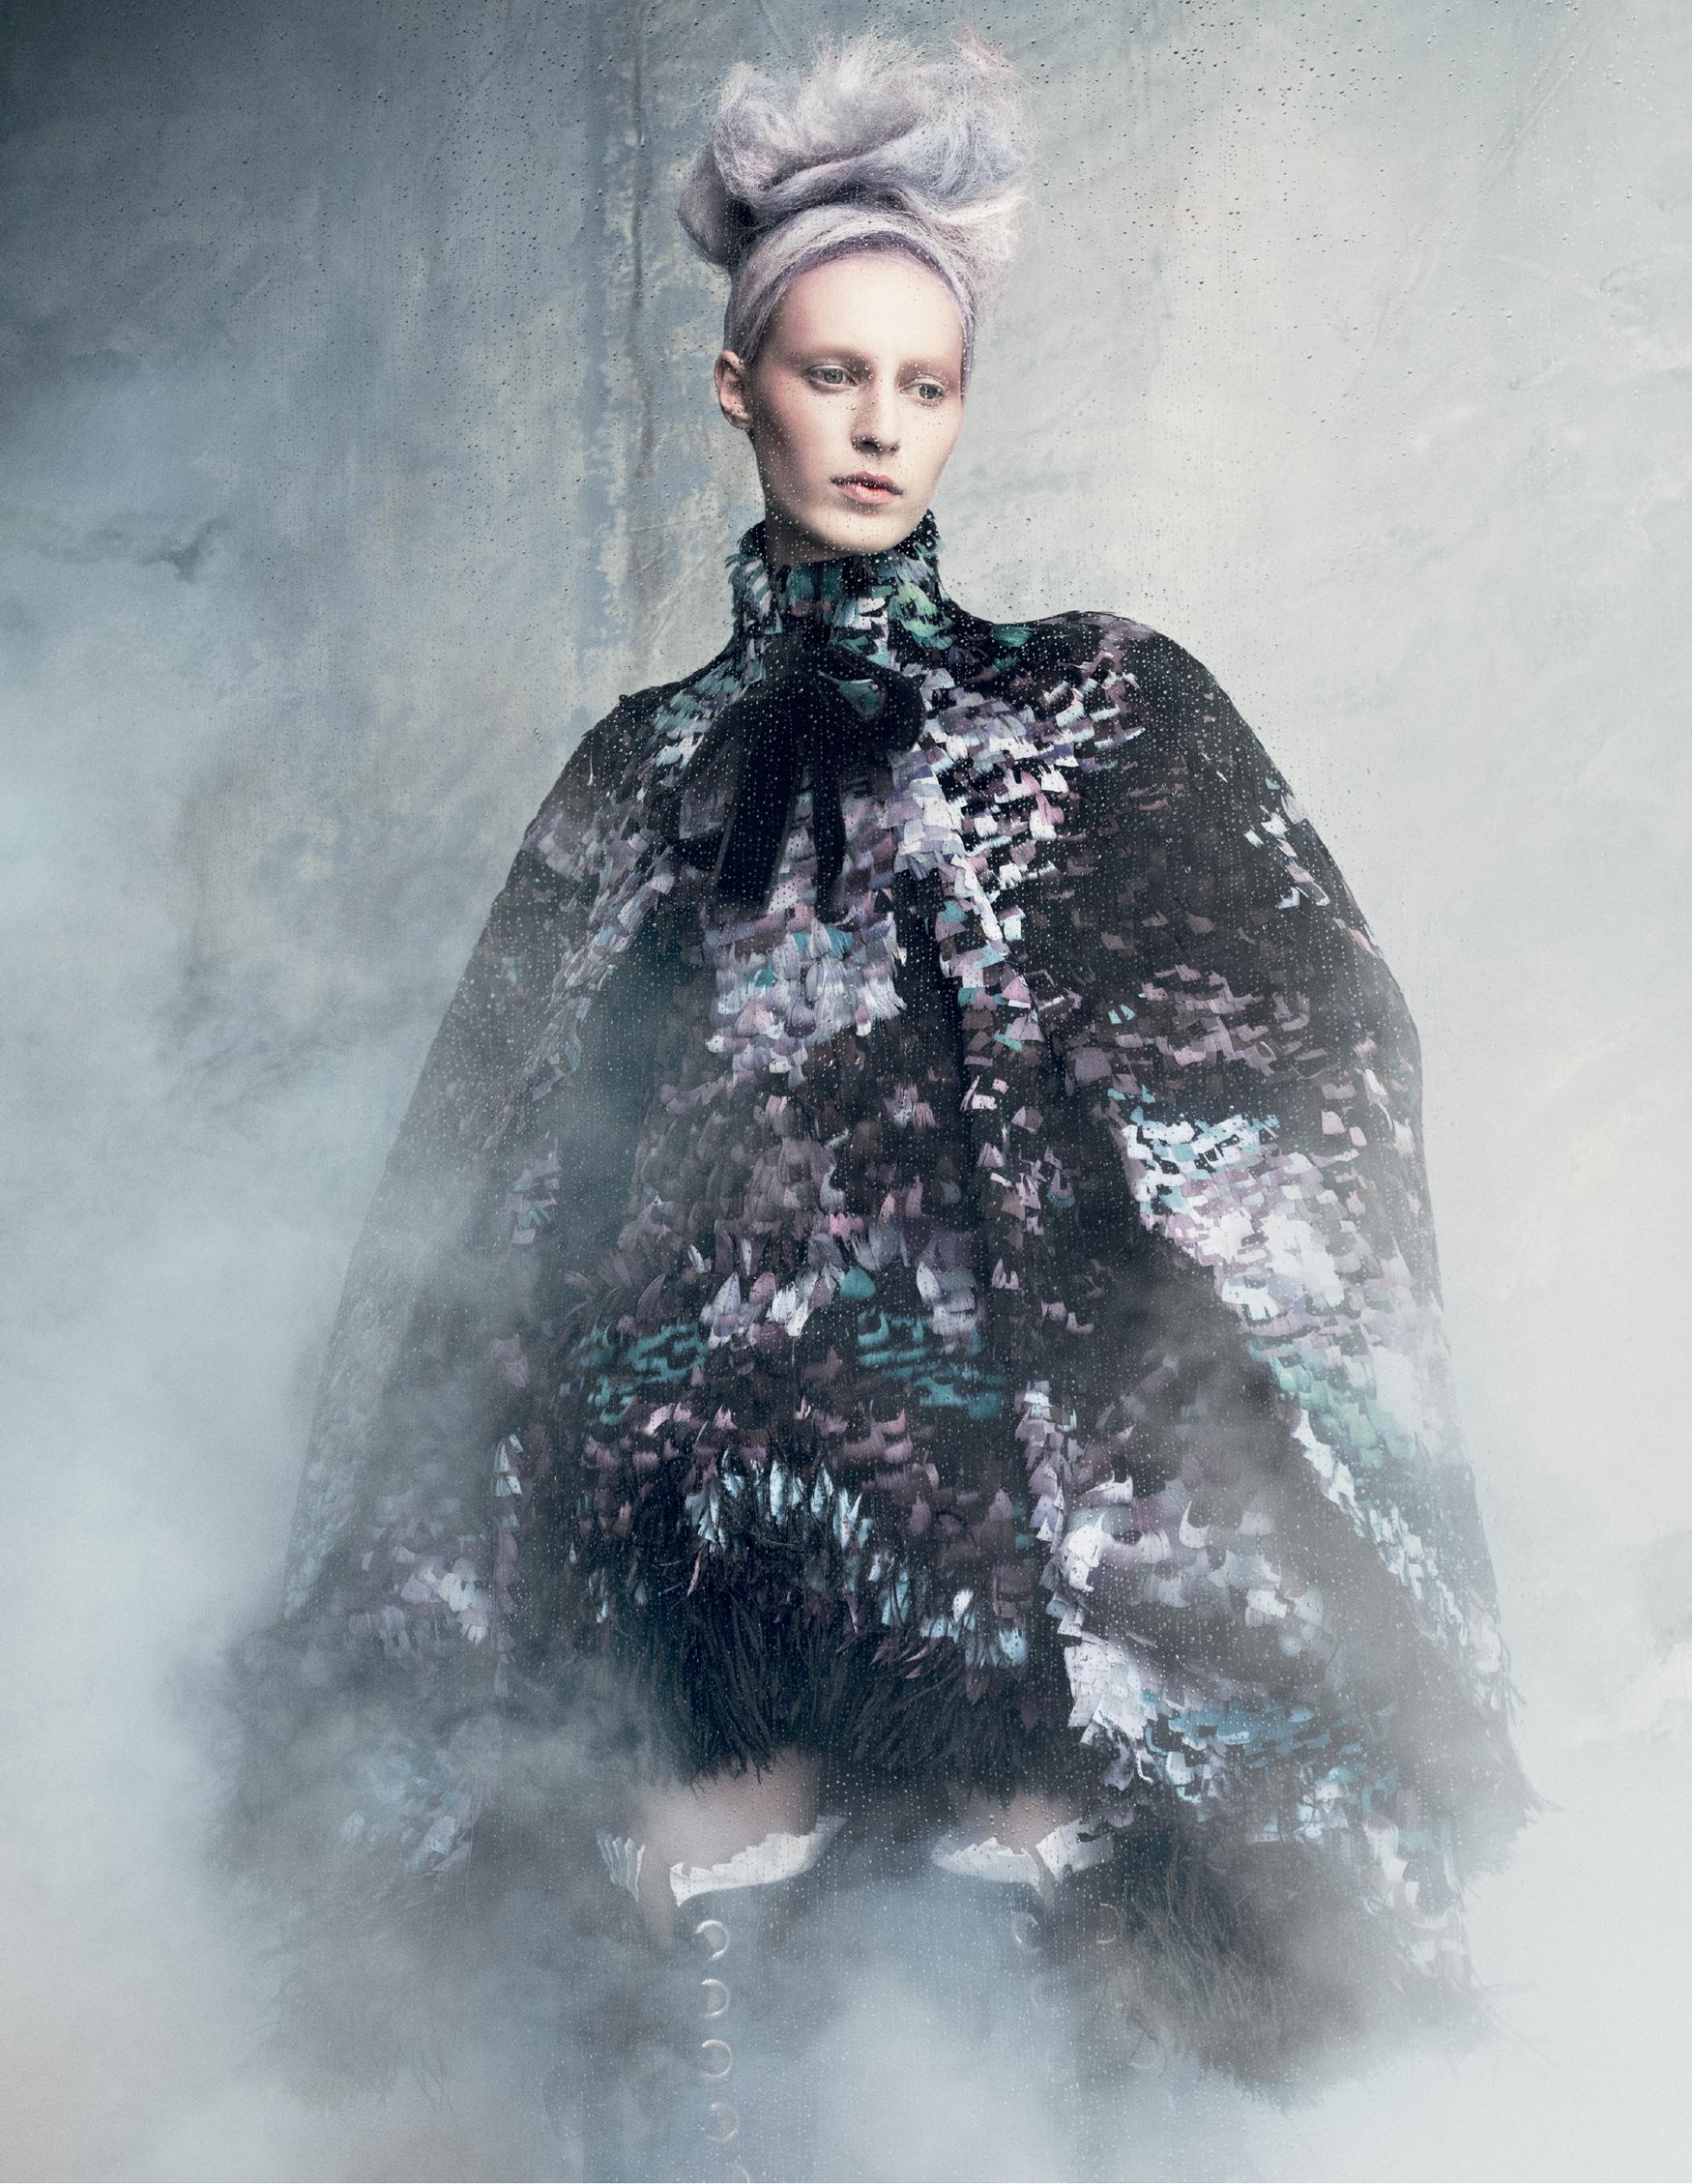 Giovanna-Battaglia-Tales-Of-Magic-And-Innocense-Vogue-Japan-Daniel-Iango-V181_149_200.jpg